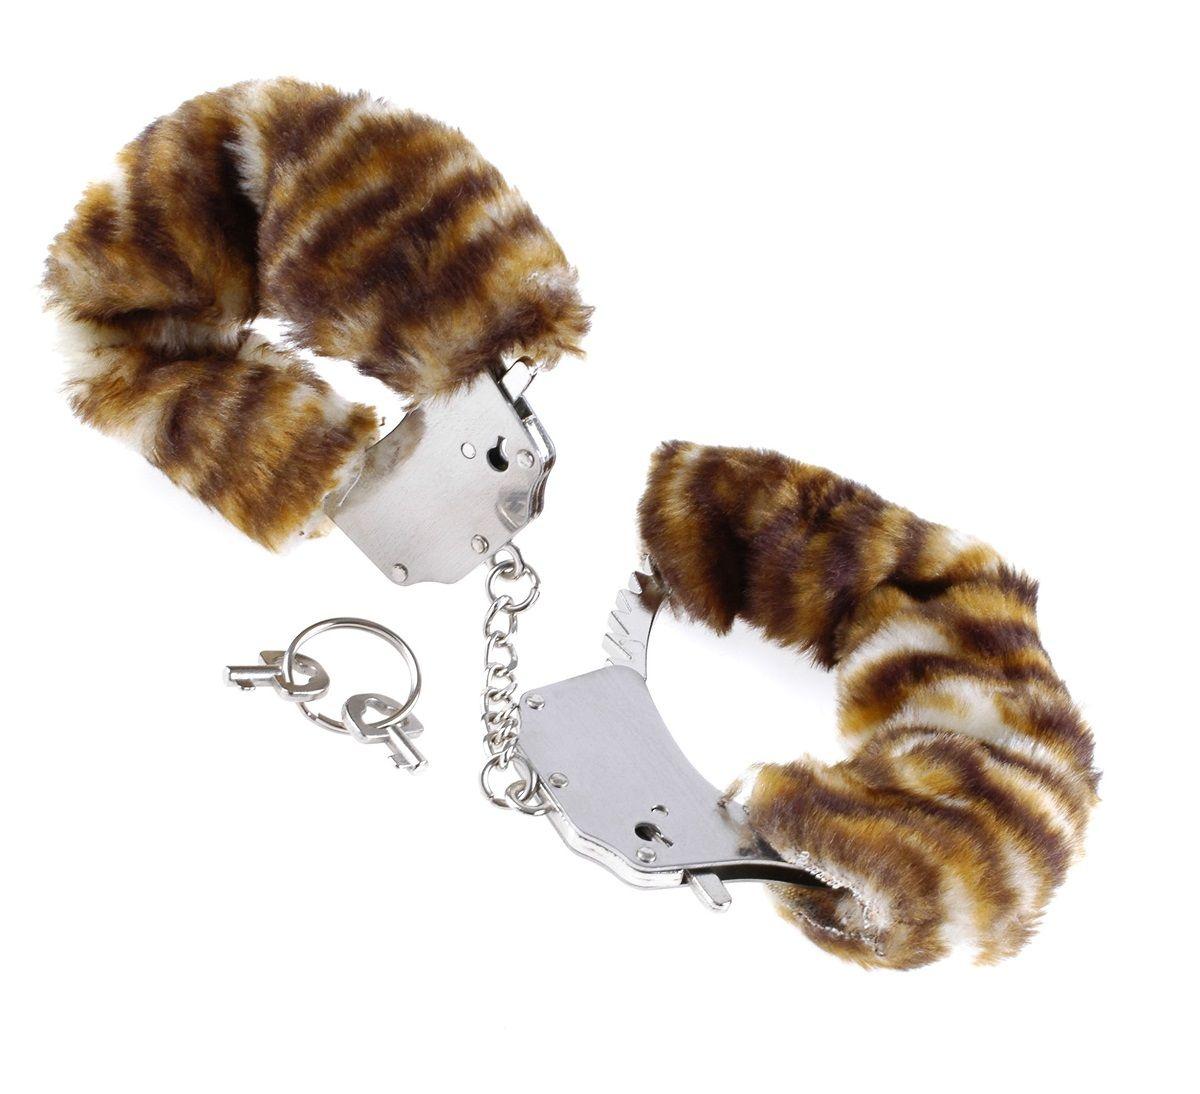 Металлические наручники Original Furry Cuffs с мехом под тигра - фото 133545